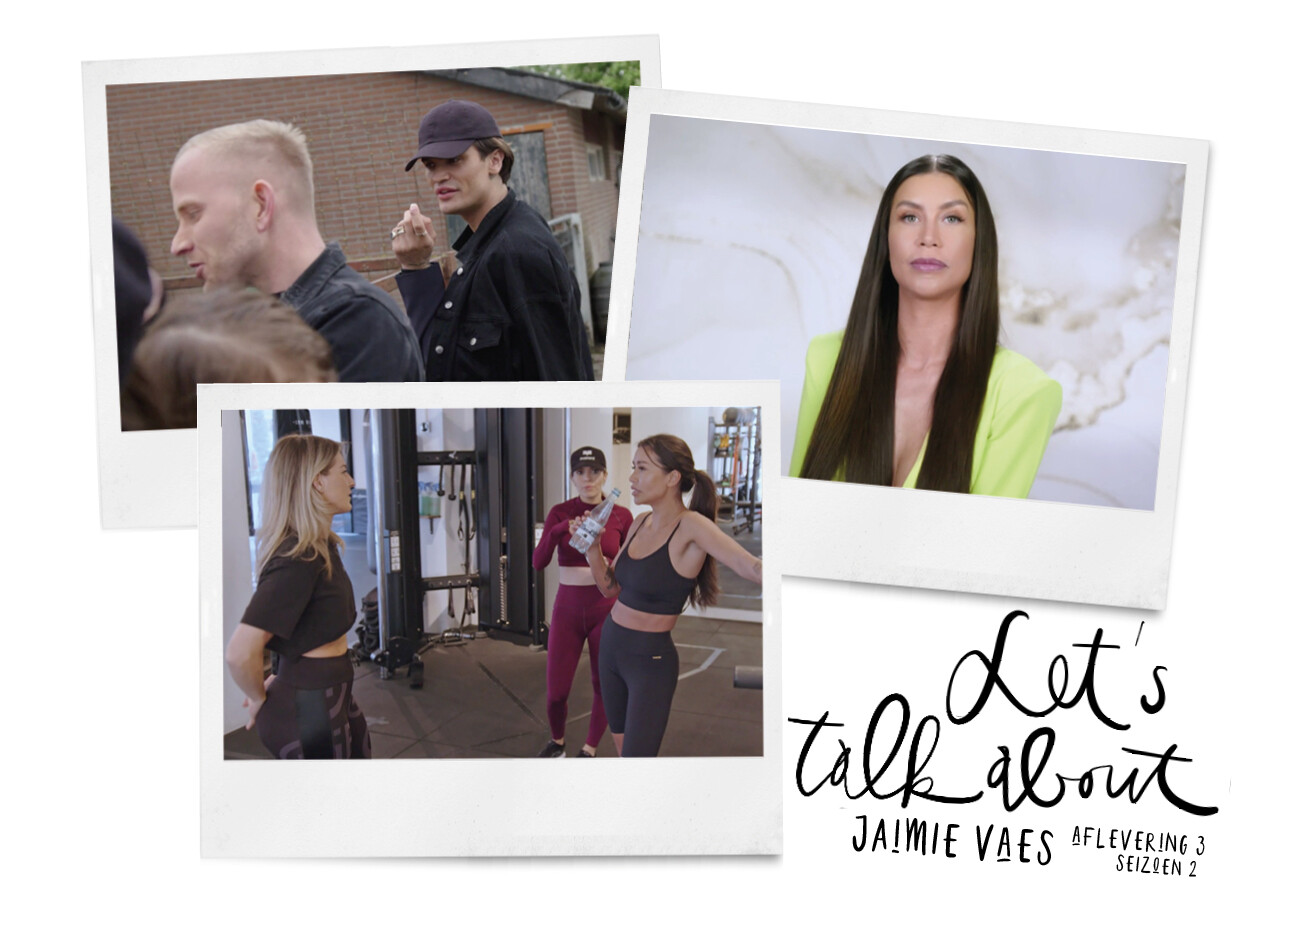 Jaimie in the Vaes Lane Life aflevering 3